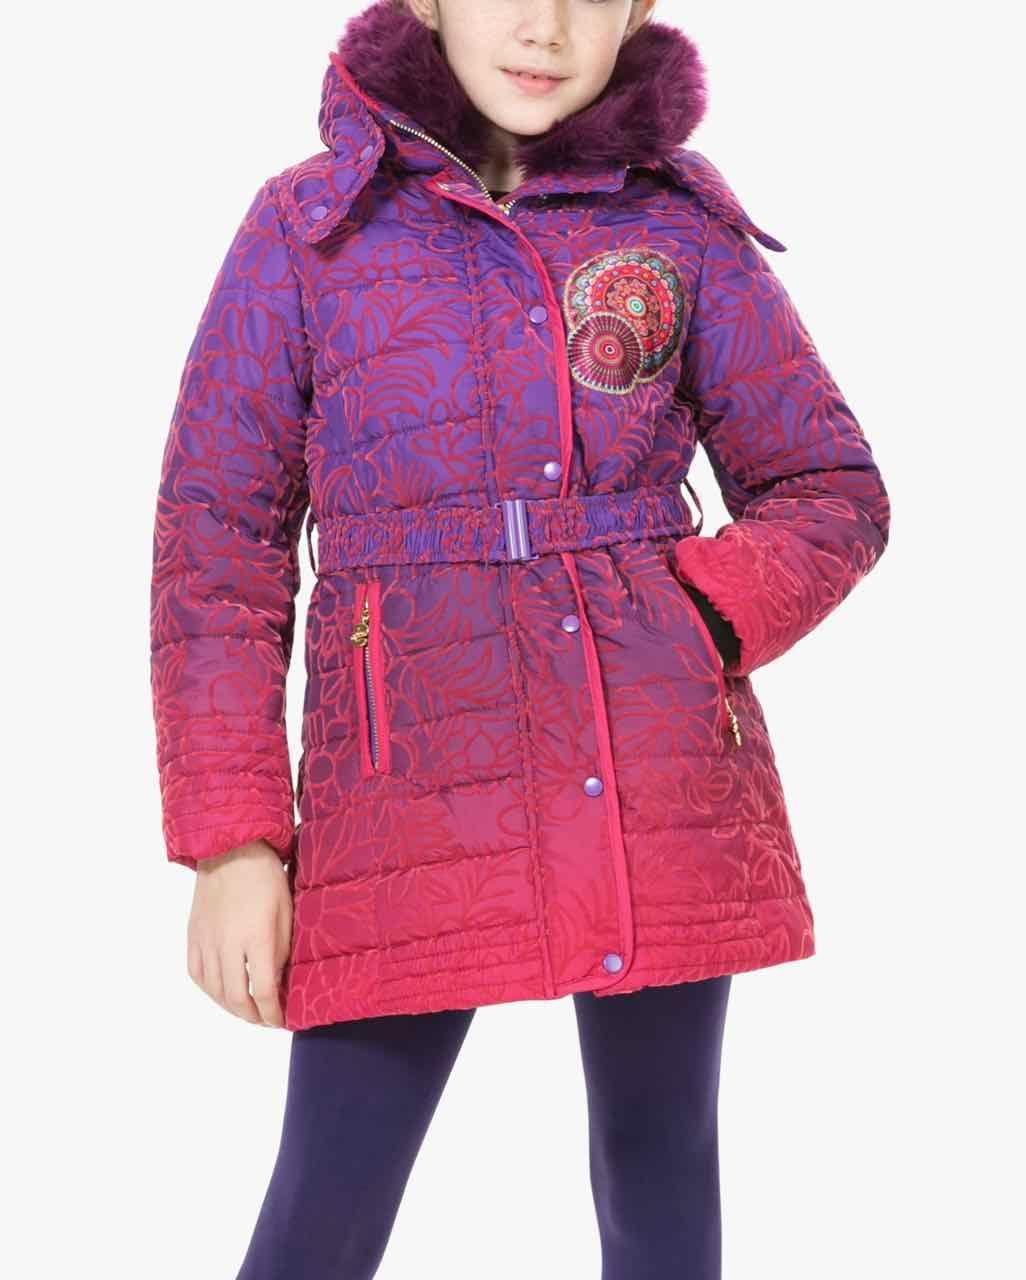 9c7cfa10dcf3 67E34B1 3125 Desigual Girl Coat Opuntia Buy Online